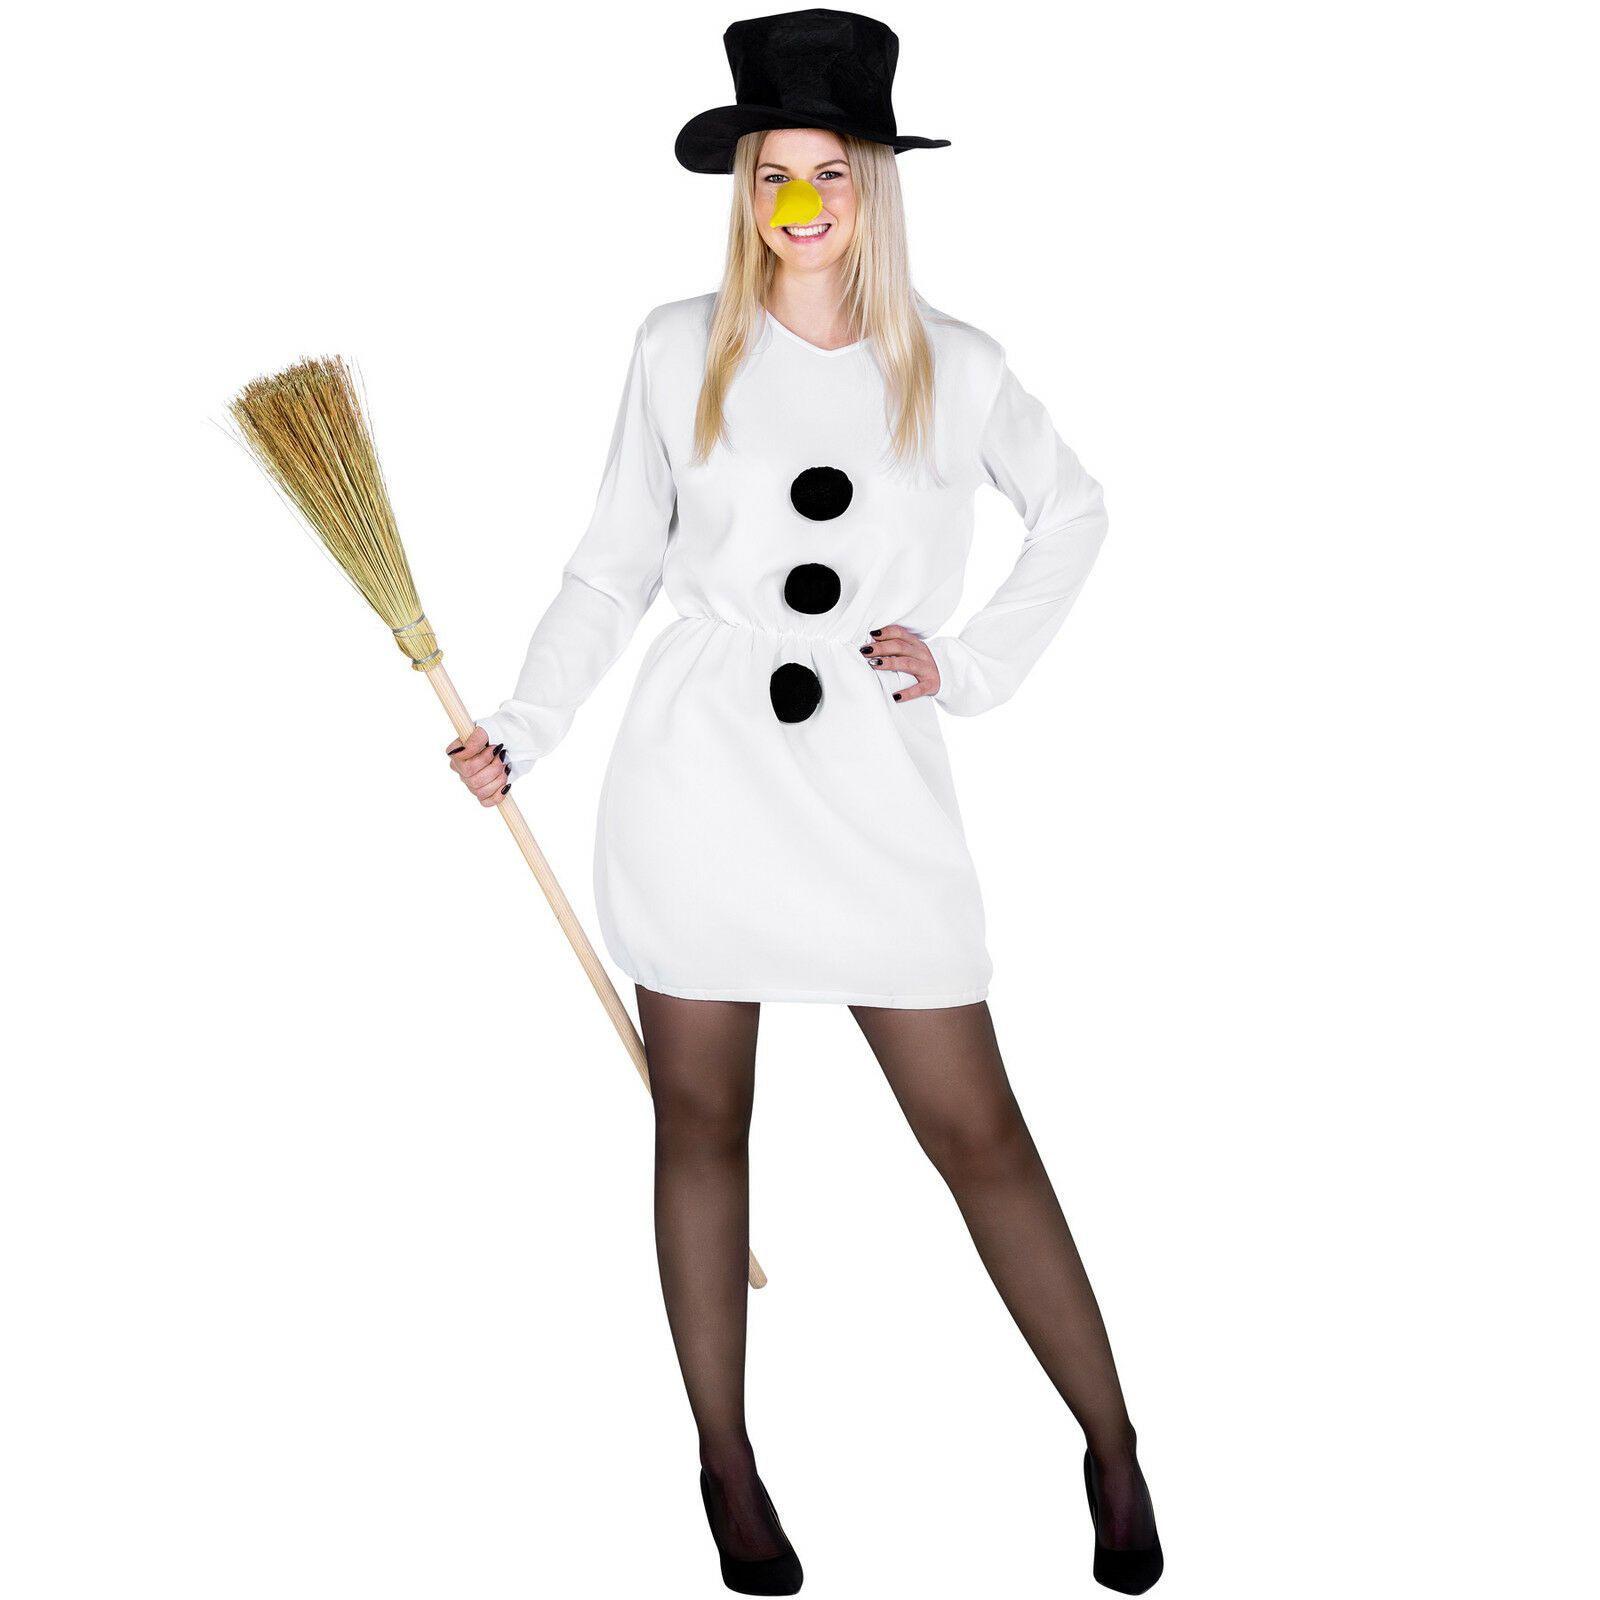 Werbung  Kostüm Schneefrau Kostüm Karneval Fasching